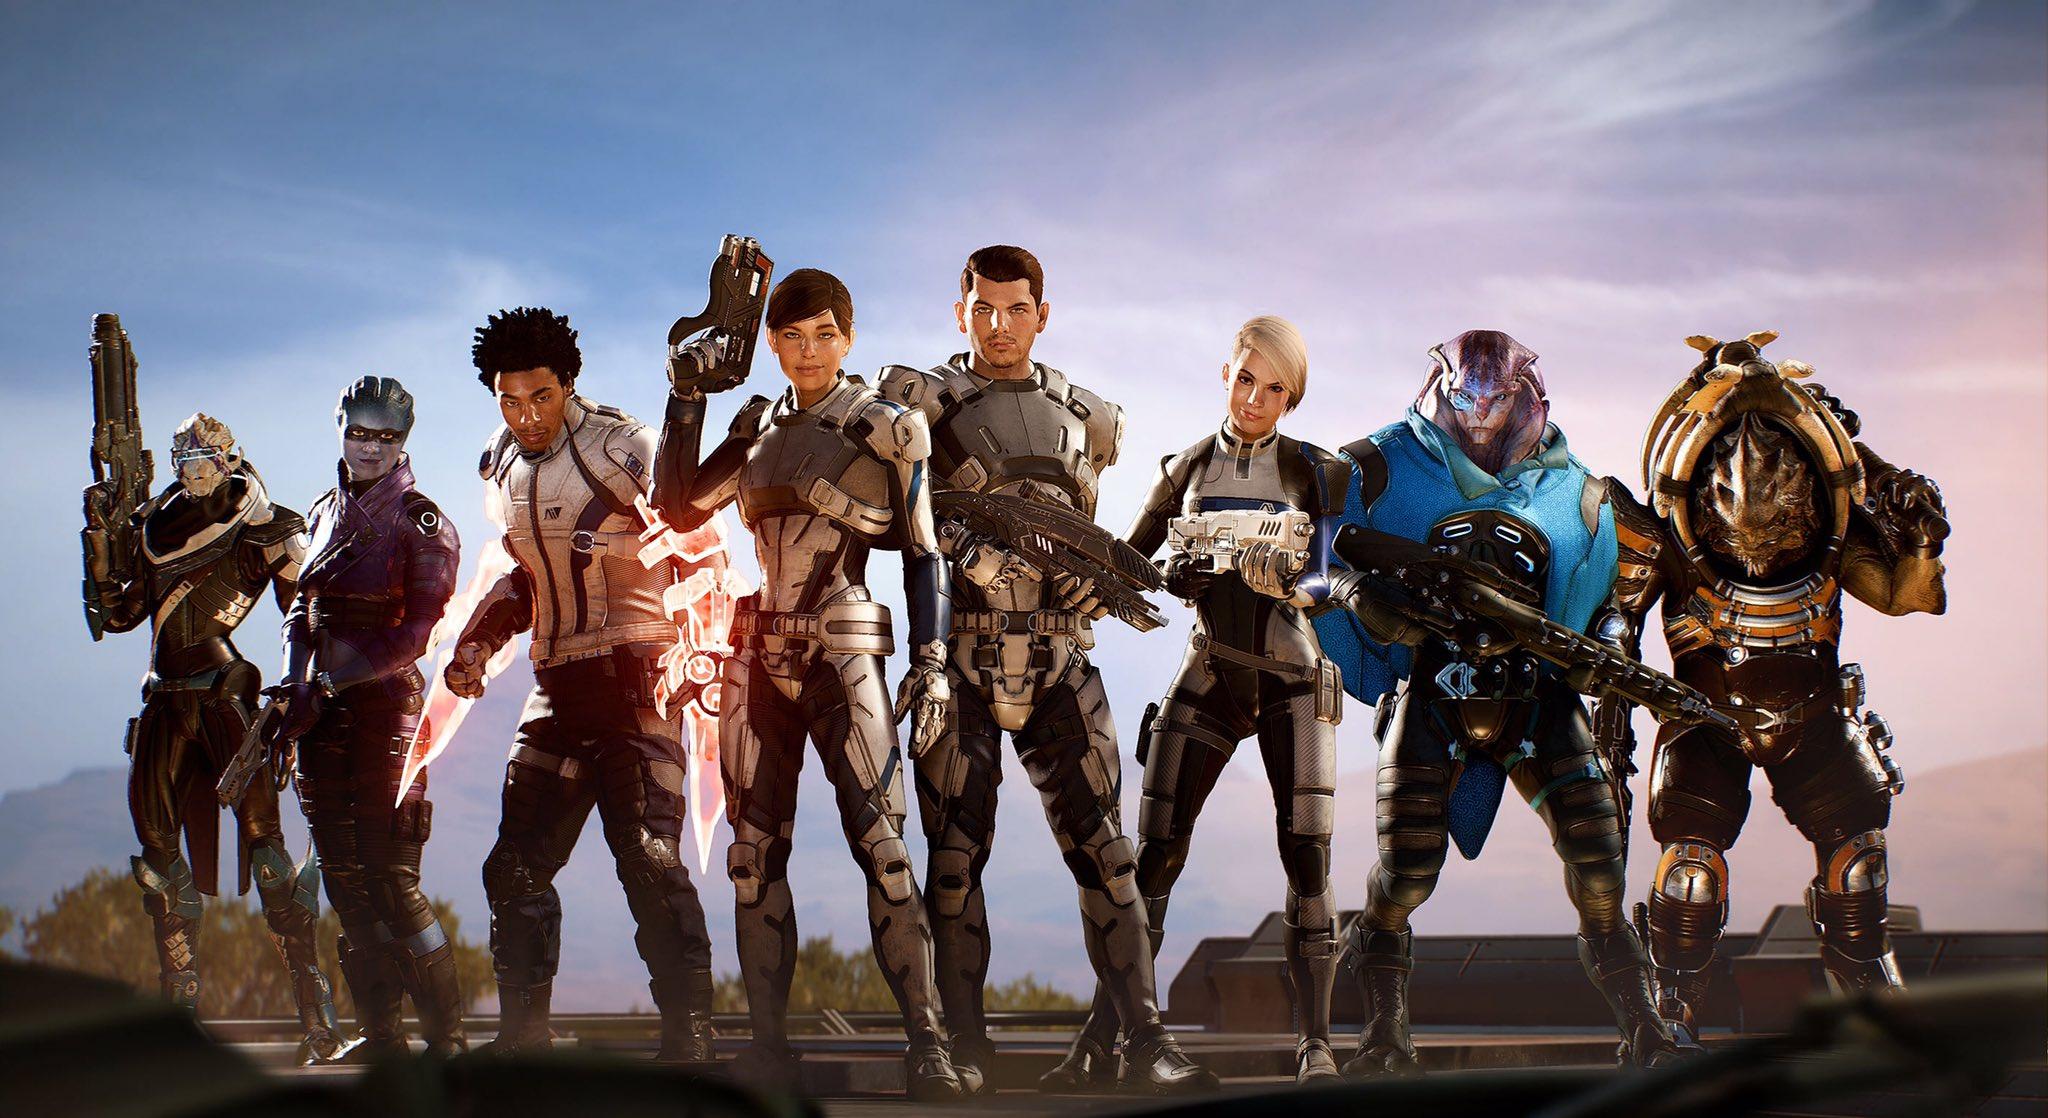 3UCqmEsqu9BM2SL93BkueW.jpg - Mass Effect: Andromeda